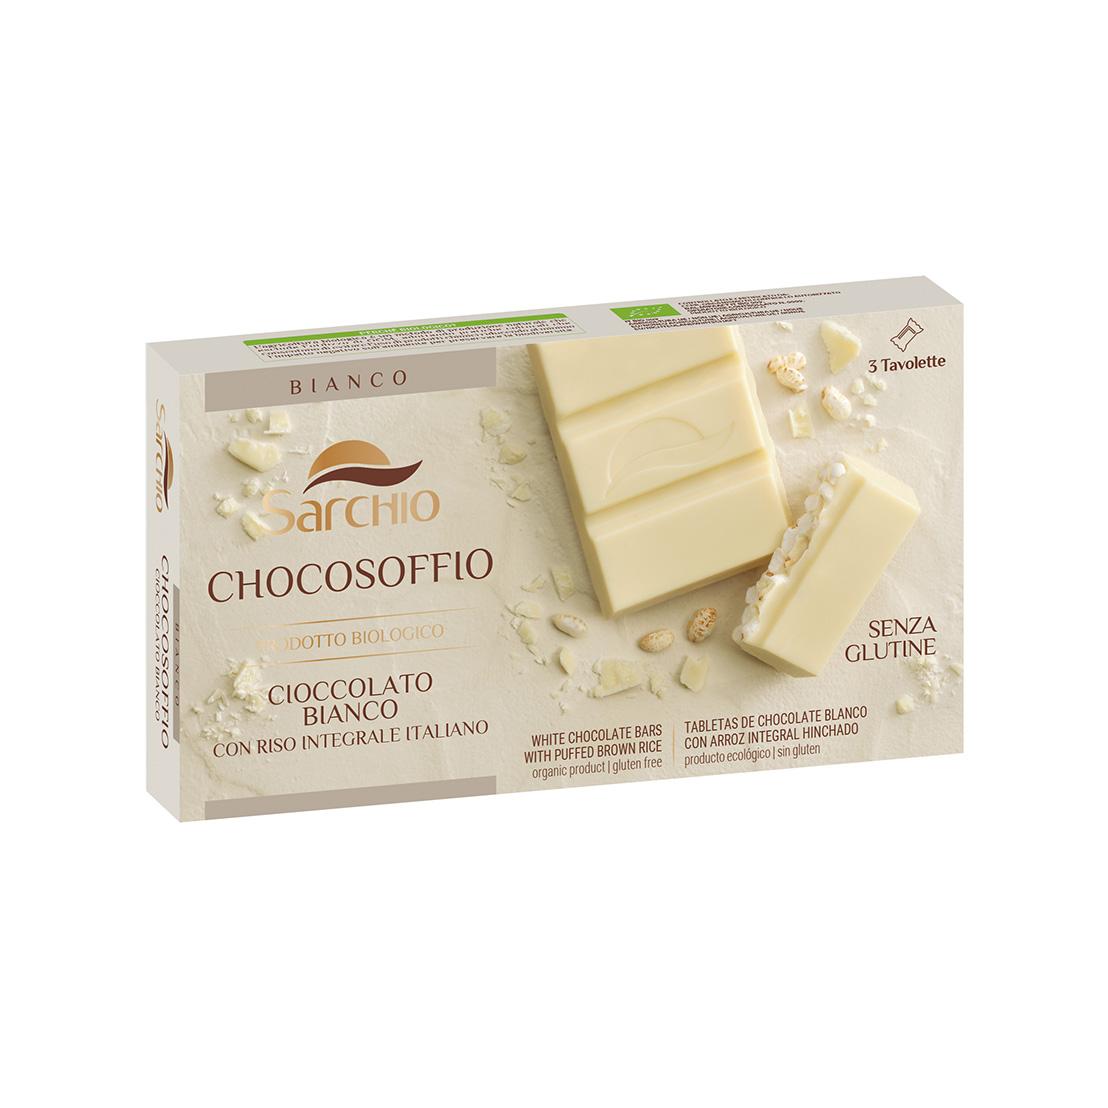 Chocosoffio